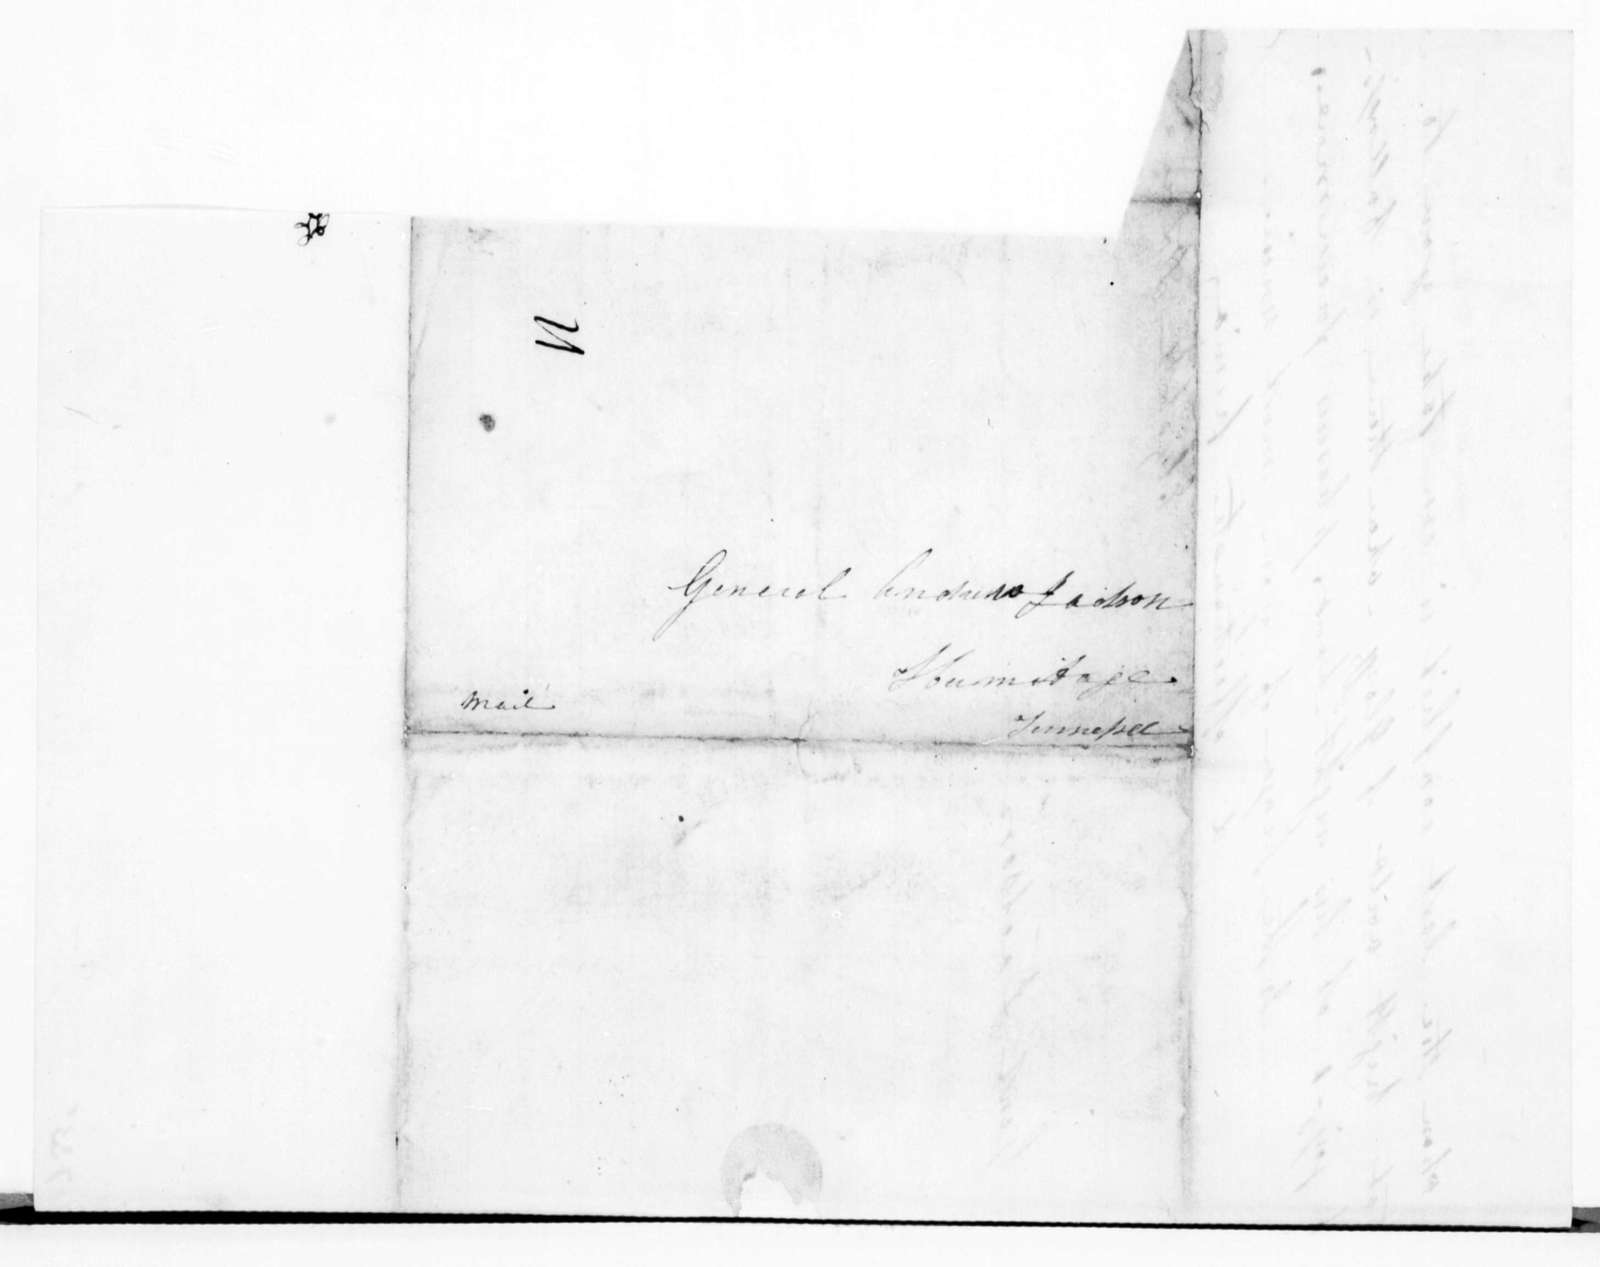 Elizabeth Dixon Love to Andrew Jackson, March 5, 1839